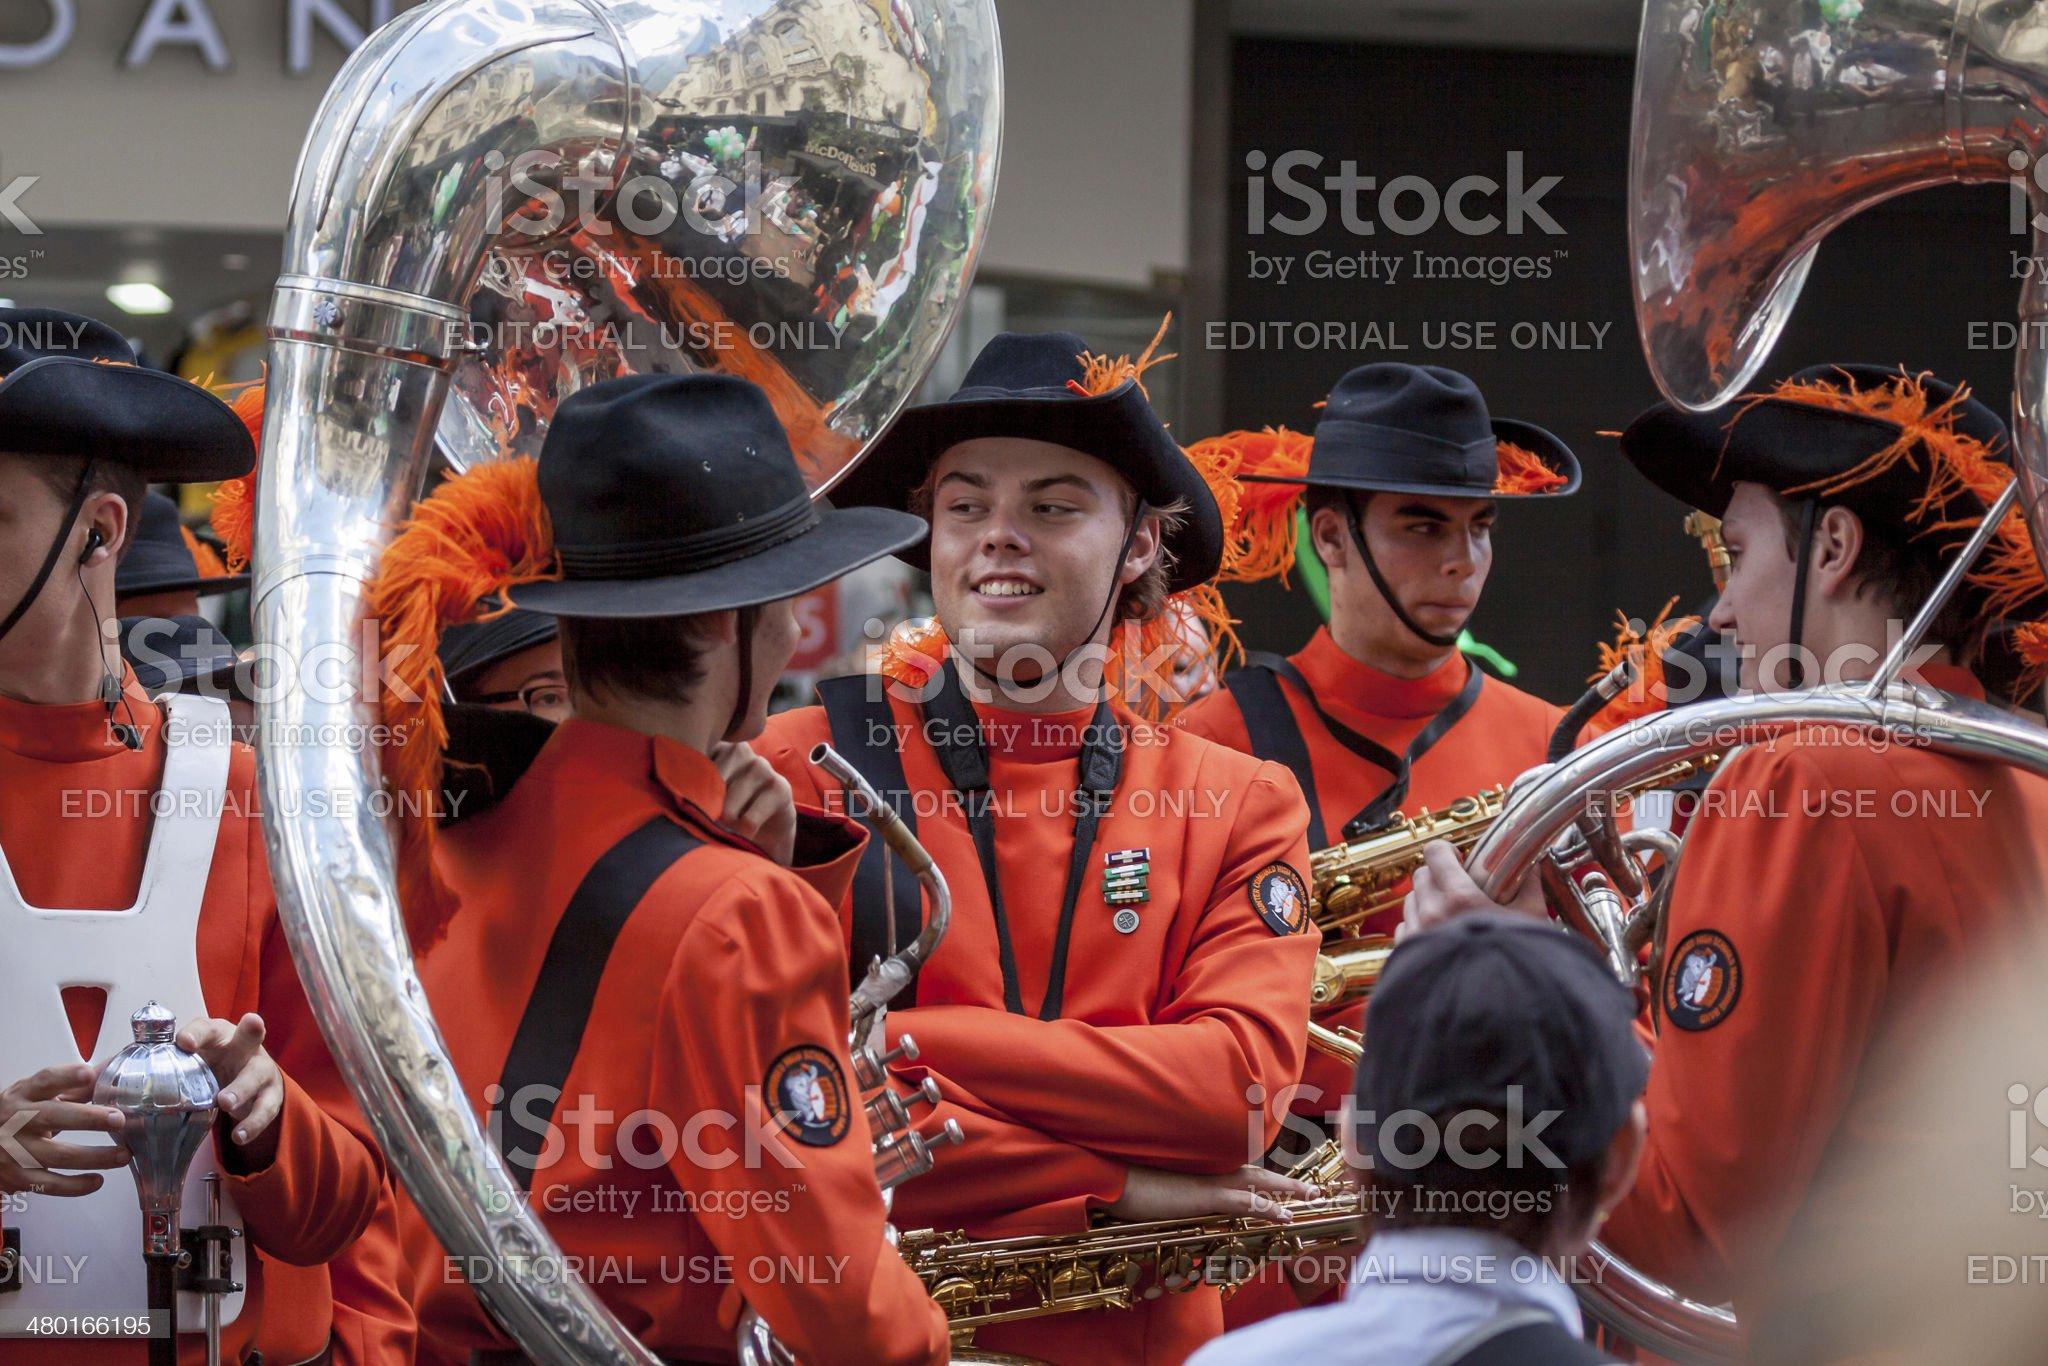 Sydney St Patrick's Day  Parade royalty-free stock photo